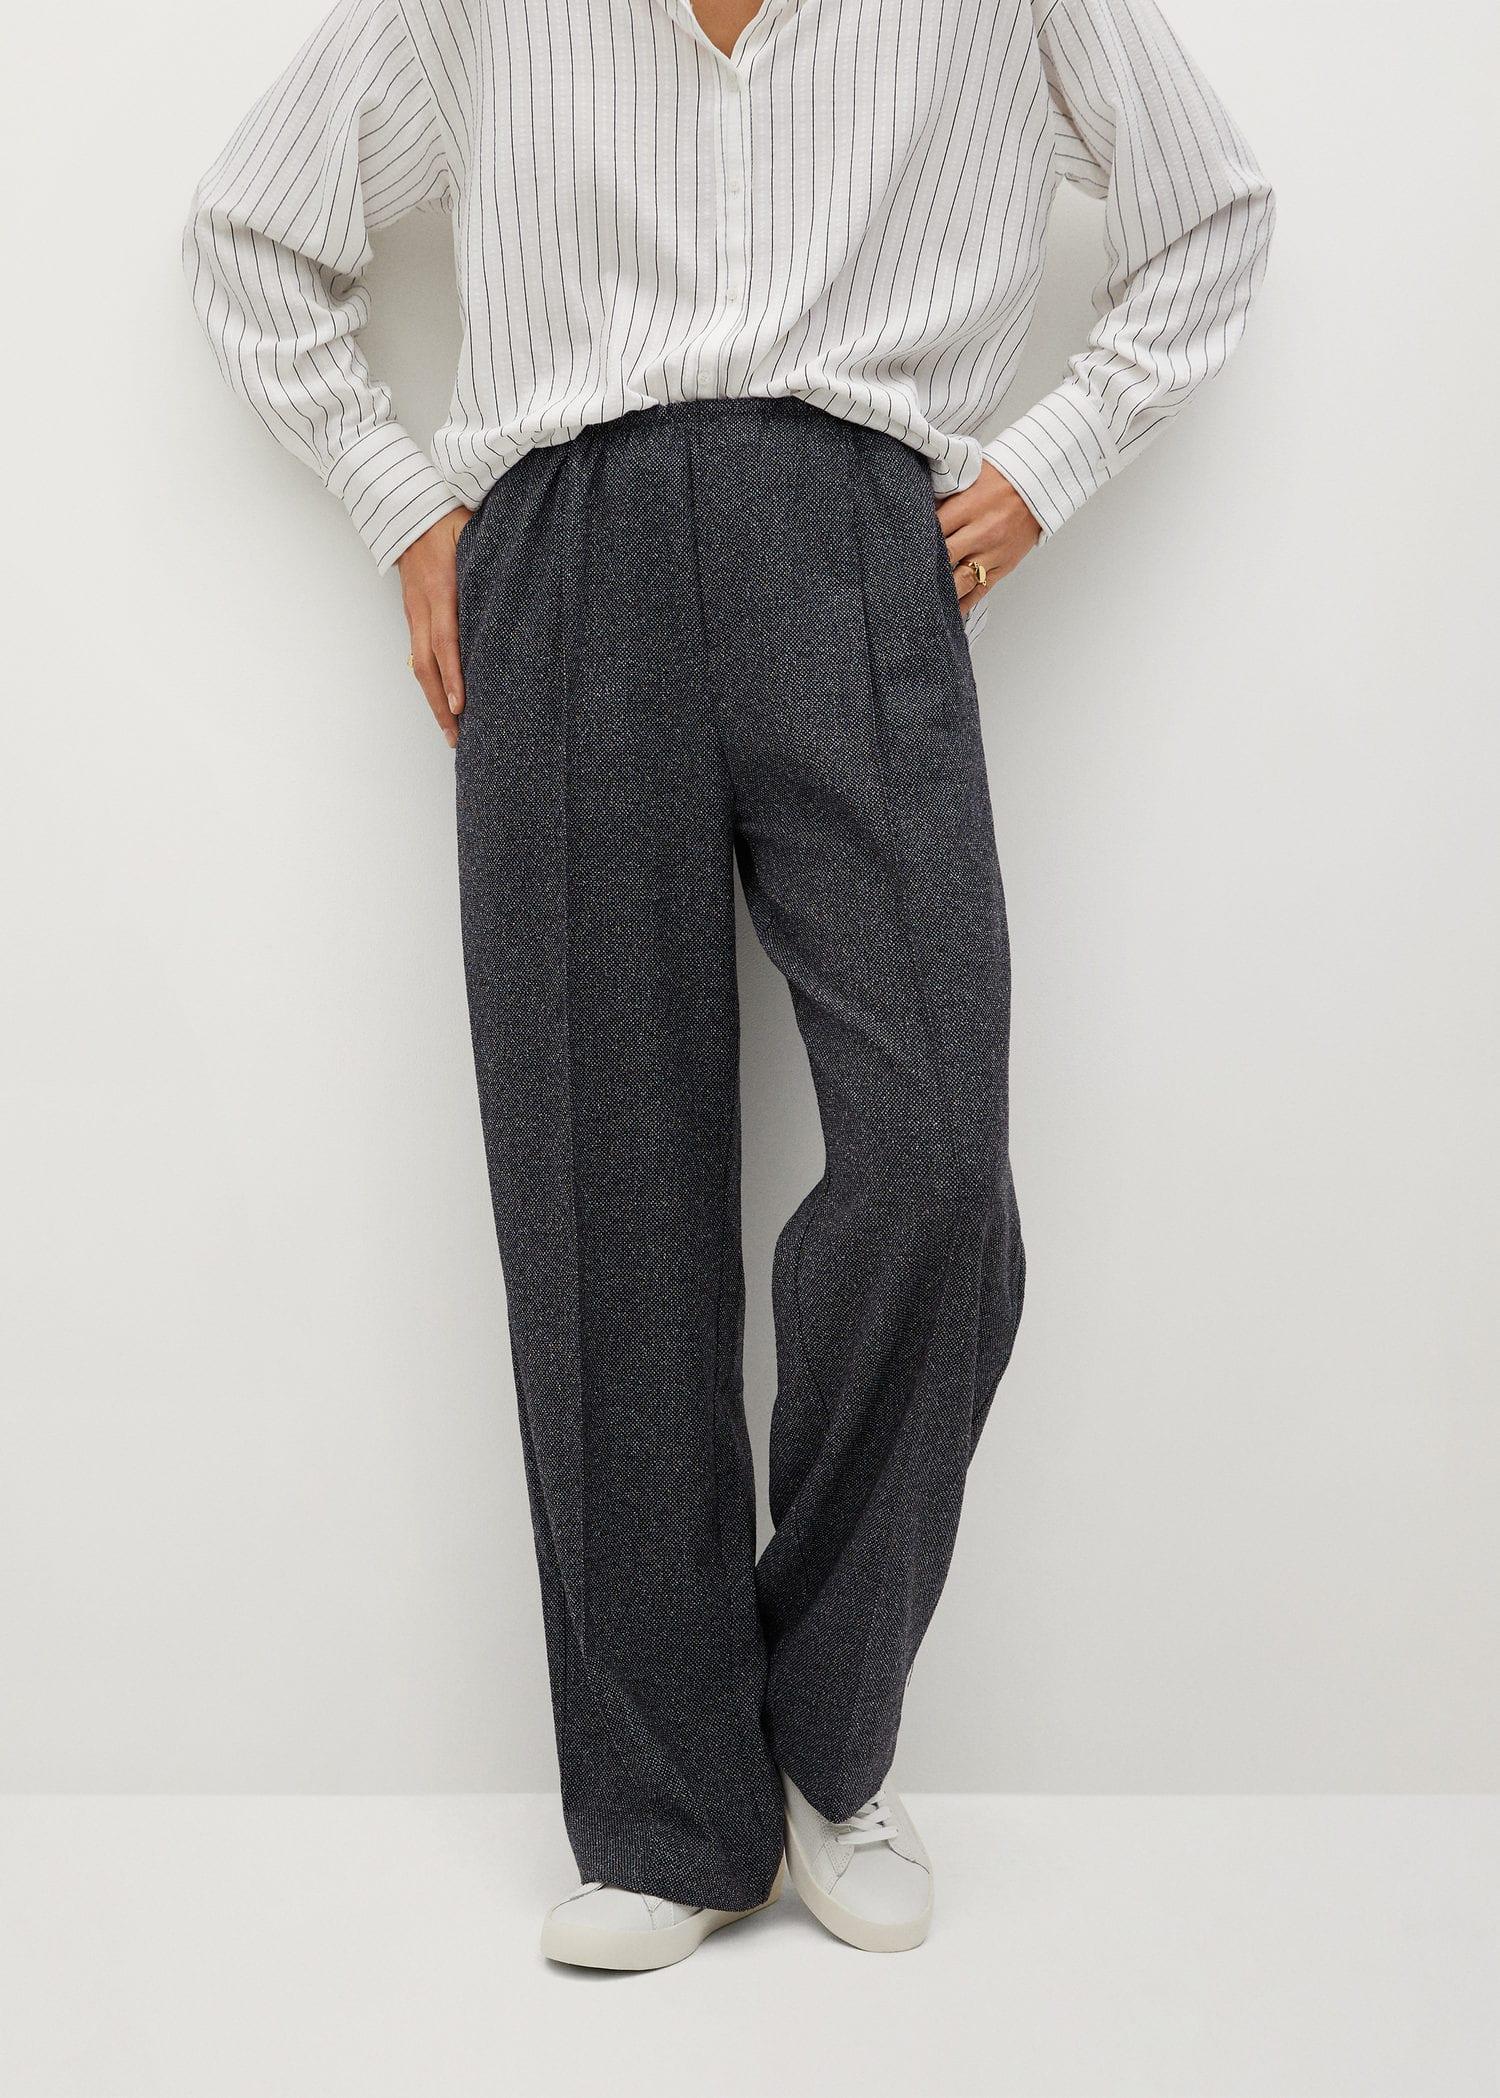 كمان كرسي المحرك Pantalones Vestir Mujer Mango Englishtoportuguesetranslation Com